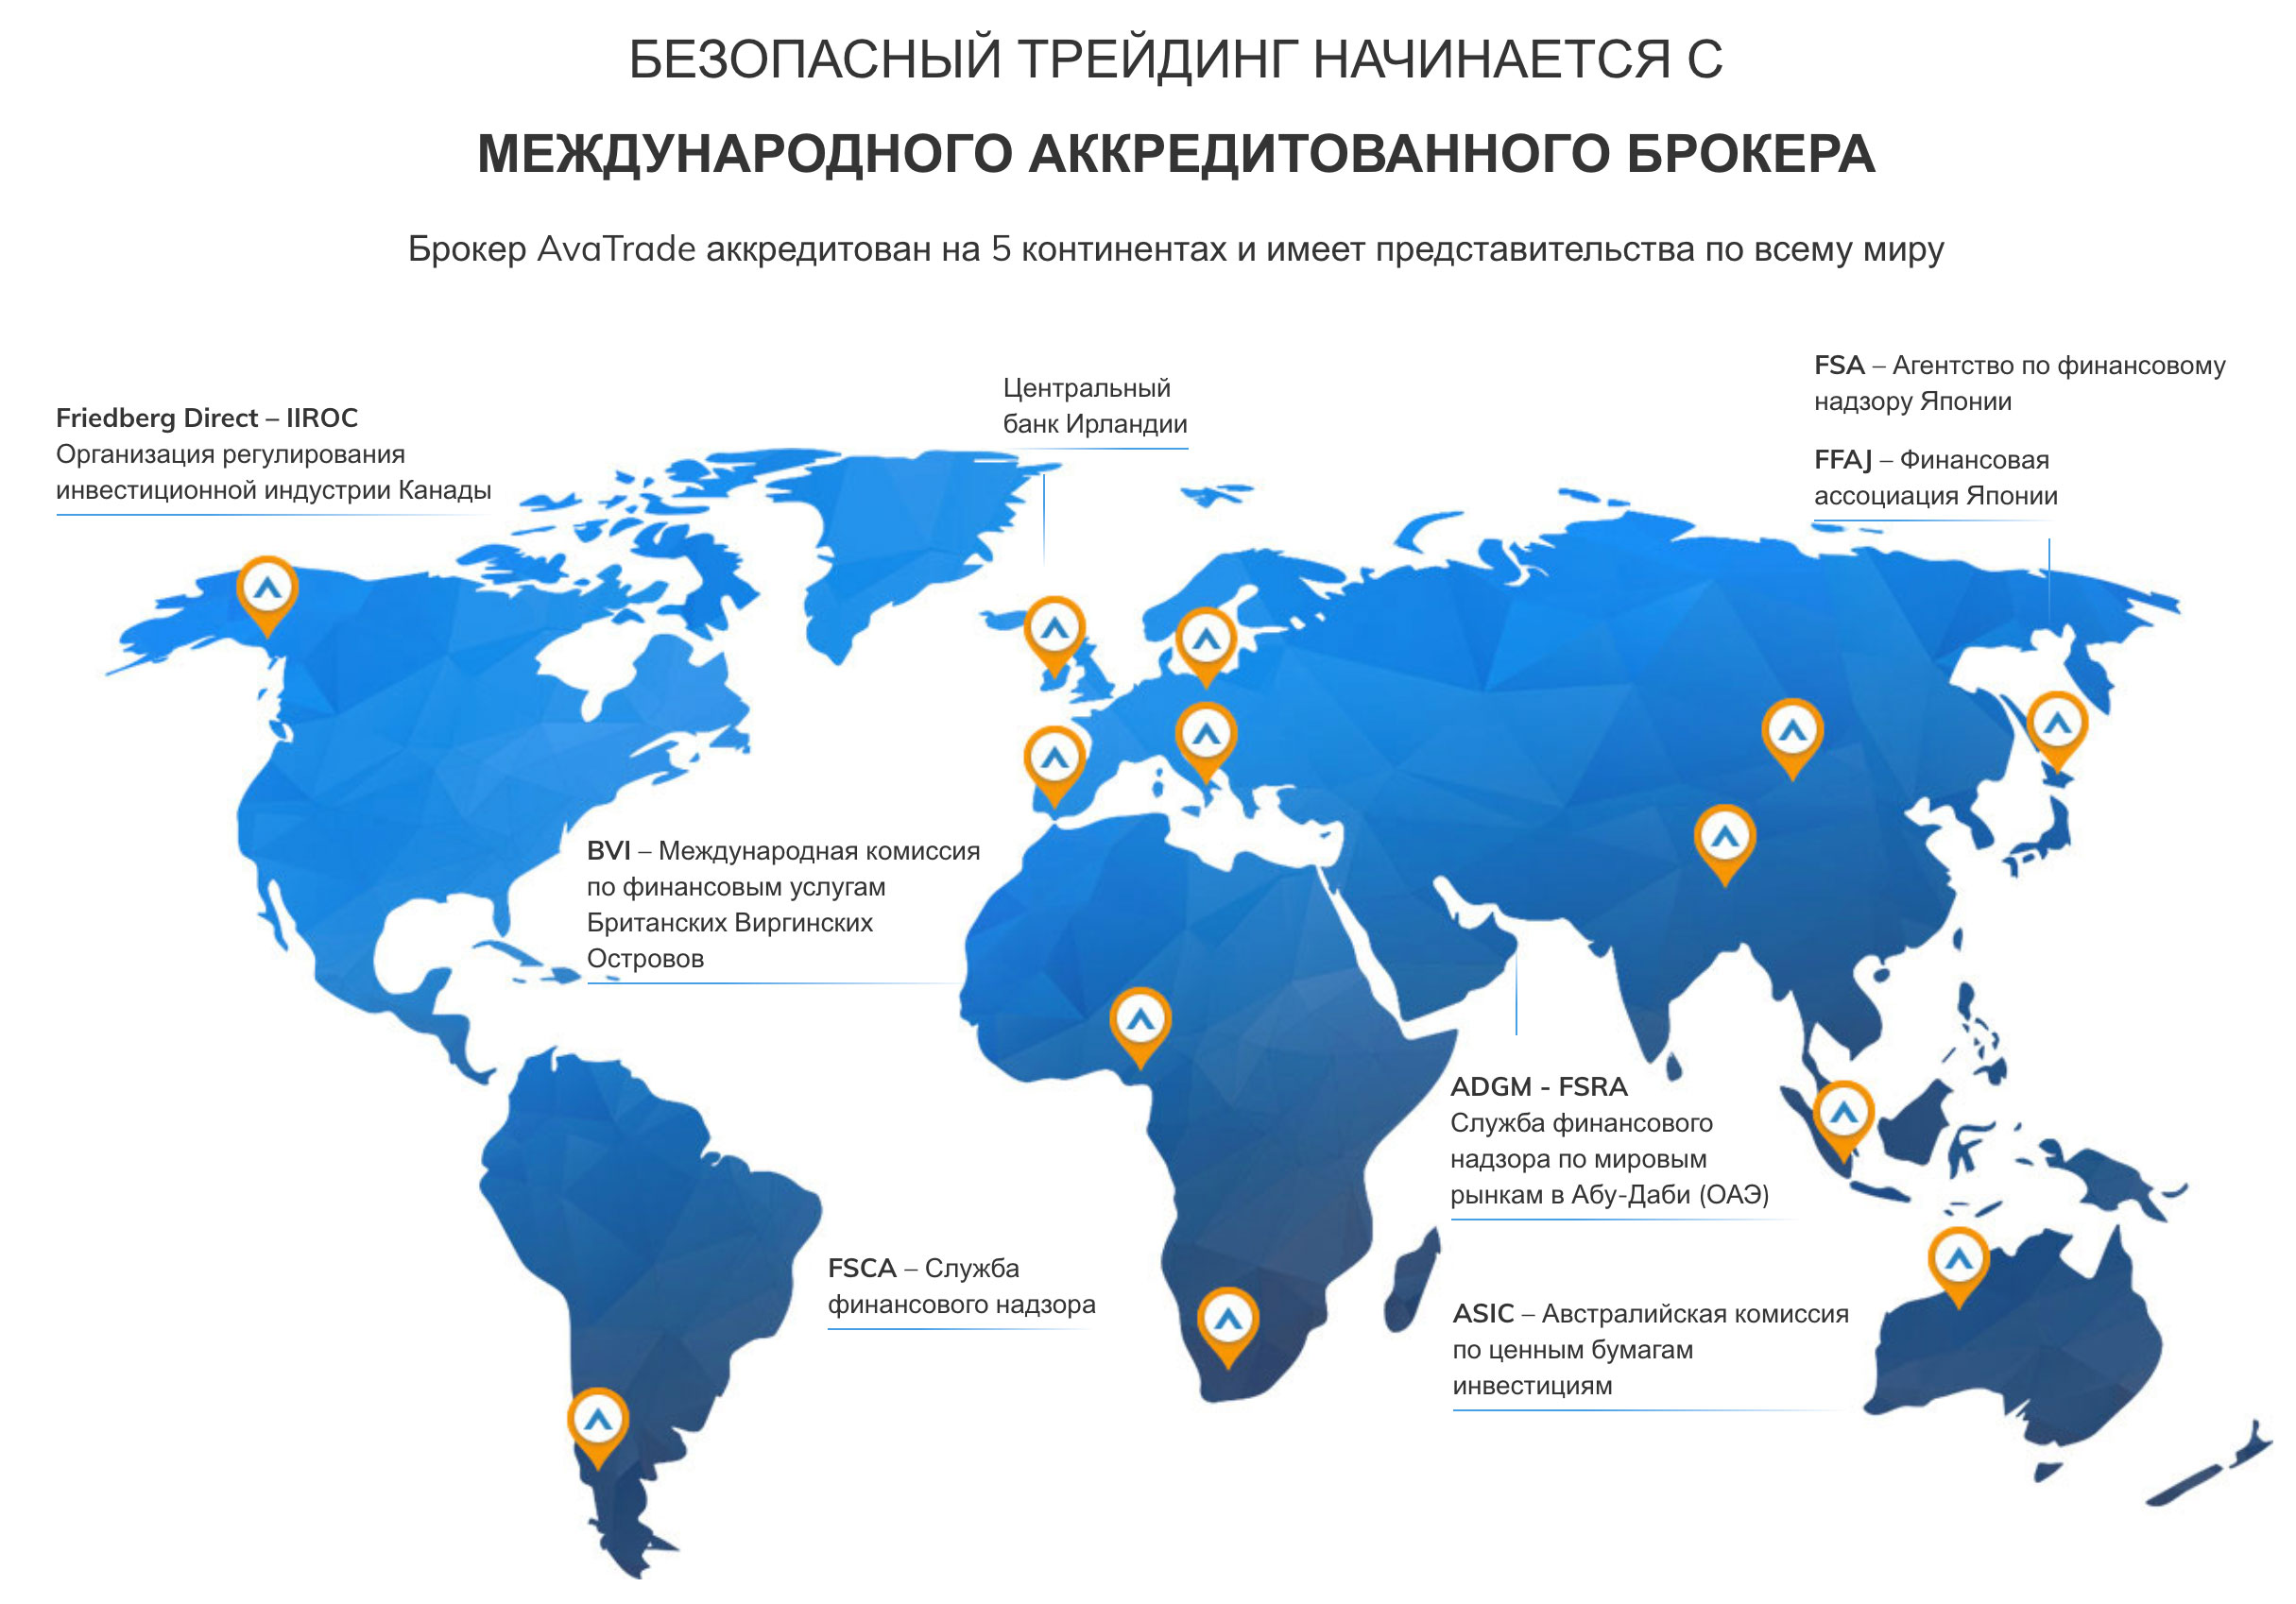 avatrade международный брокер криптобиржа